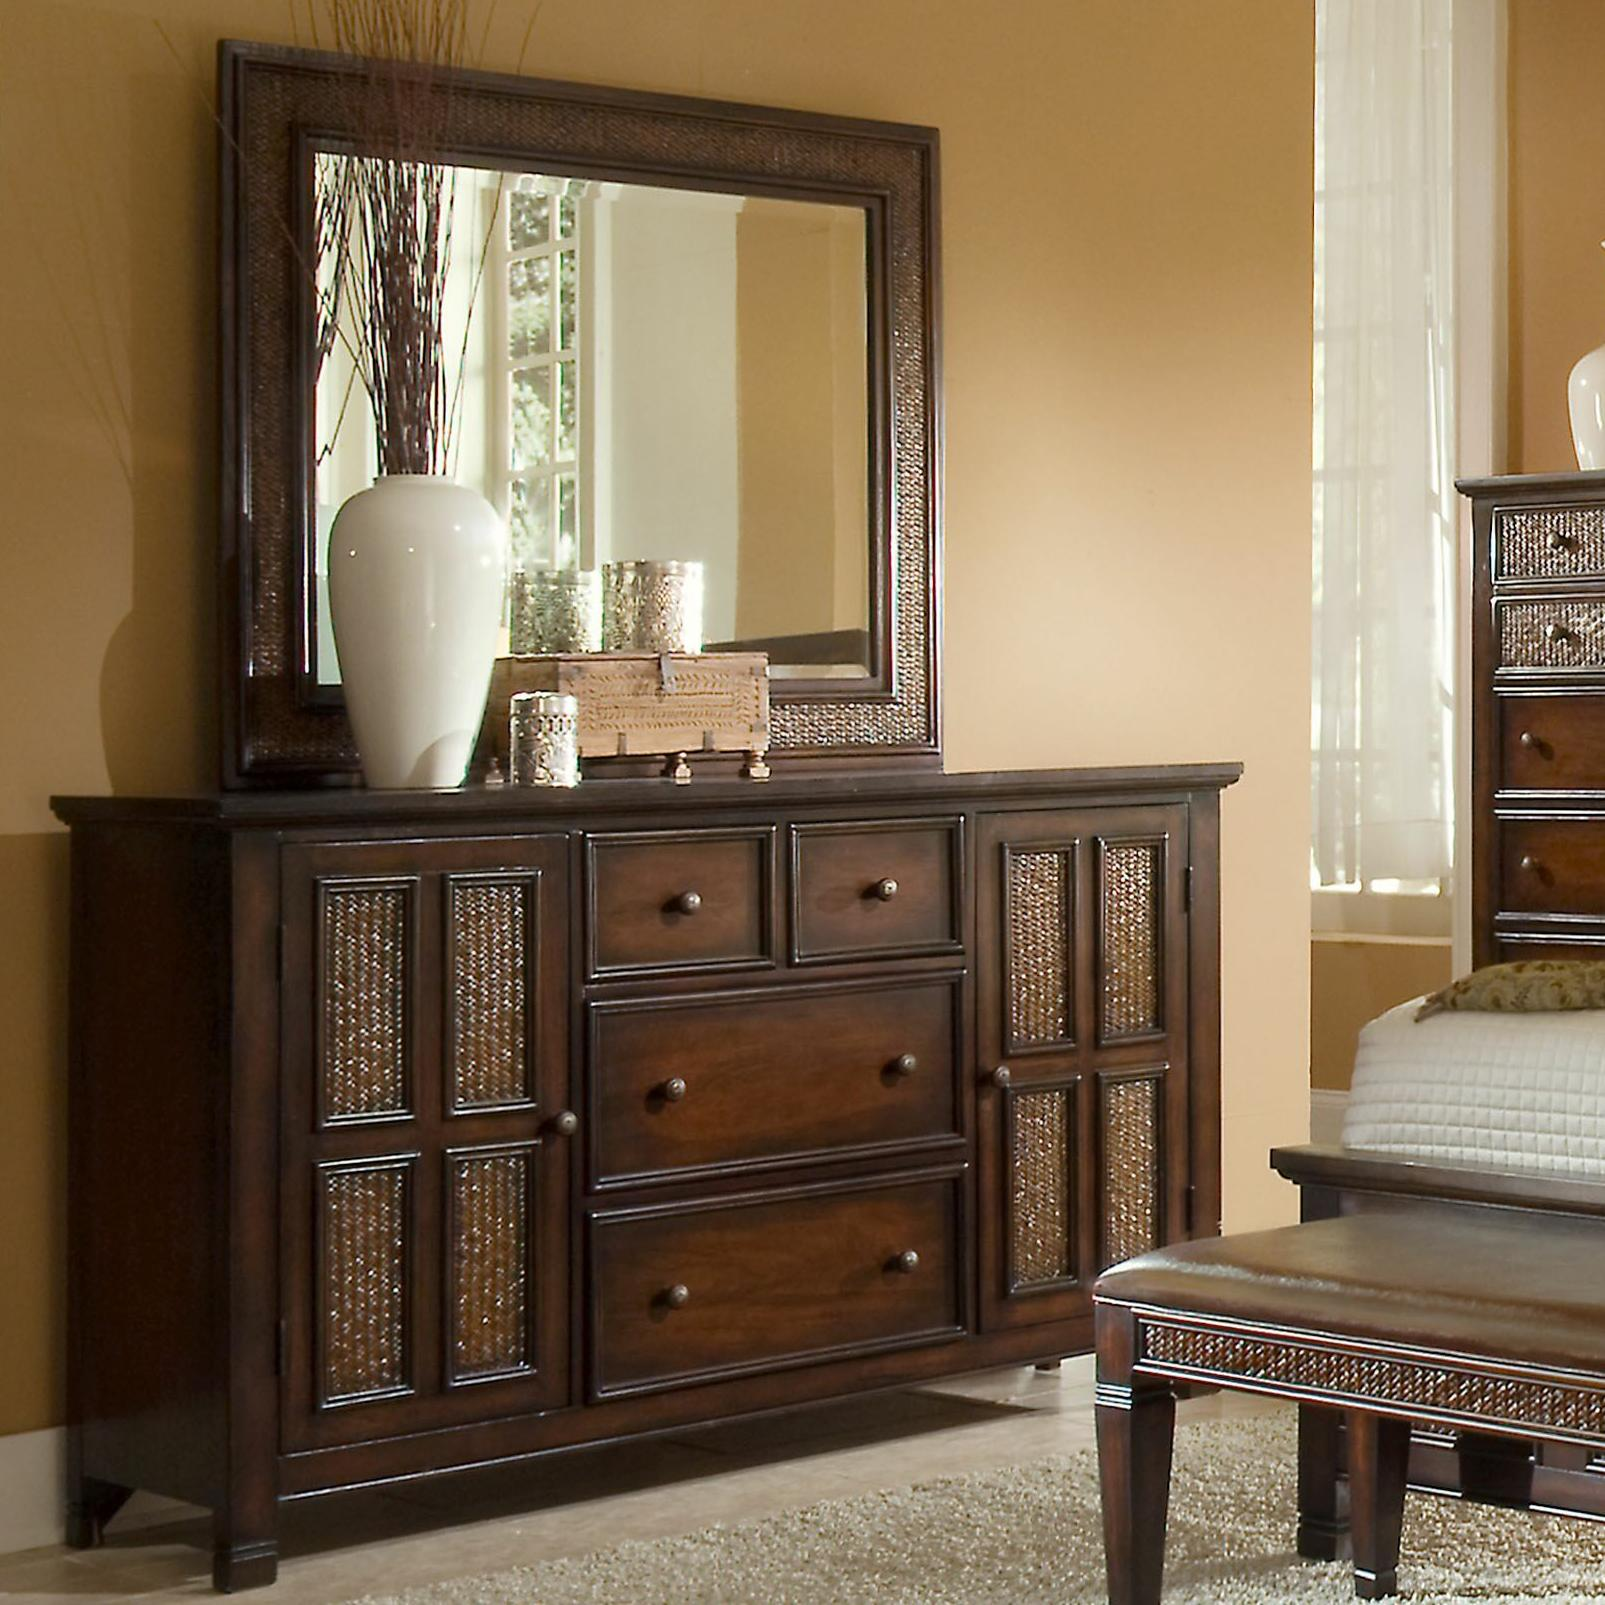 Progressive Furniture Kingston Isle Dresser With Mirror Set - Item Number: P195-50+24